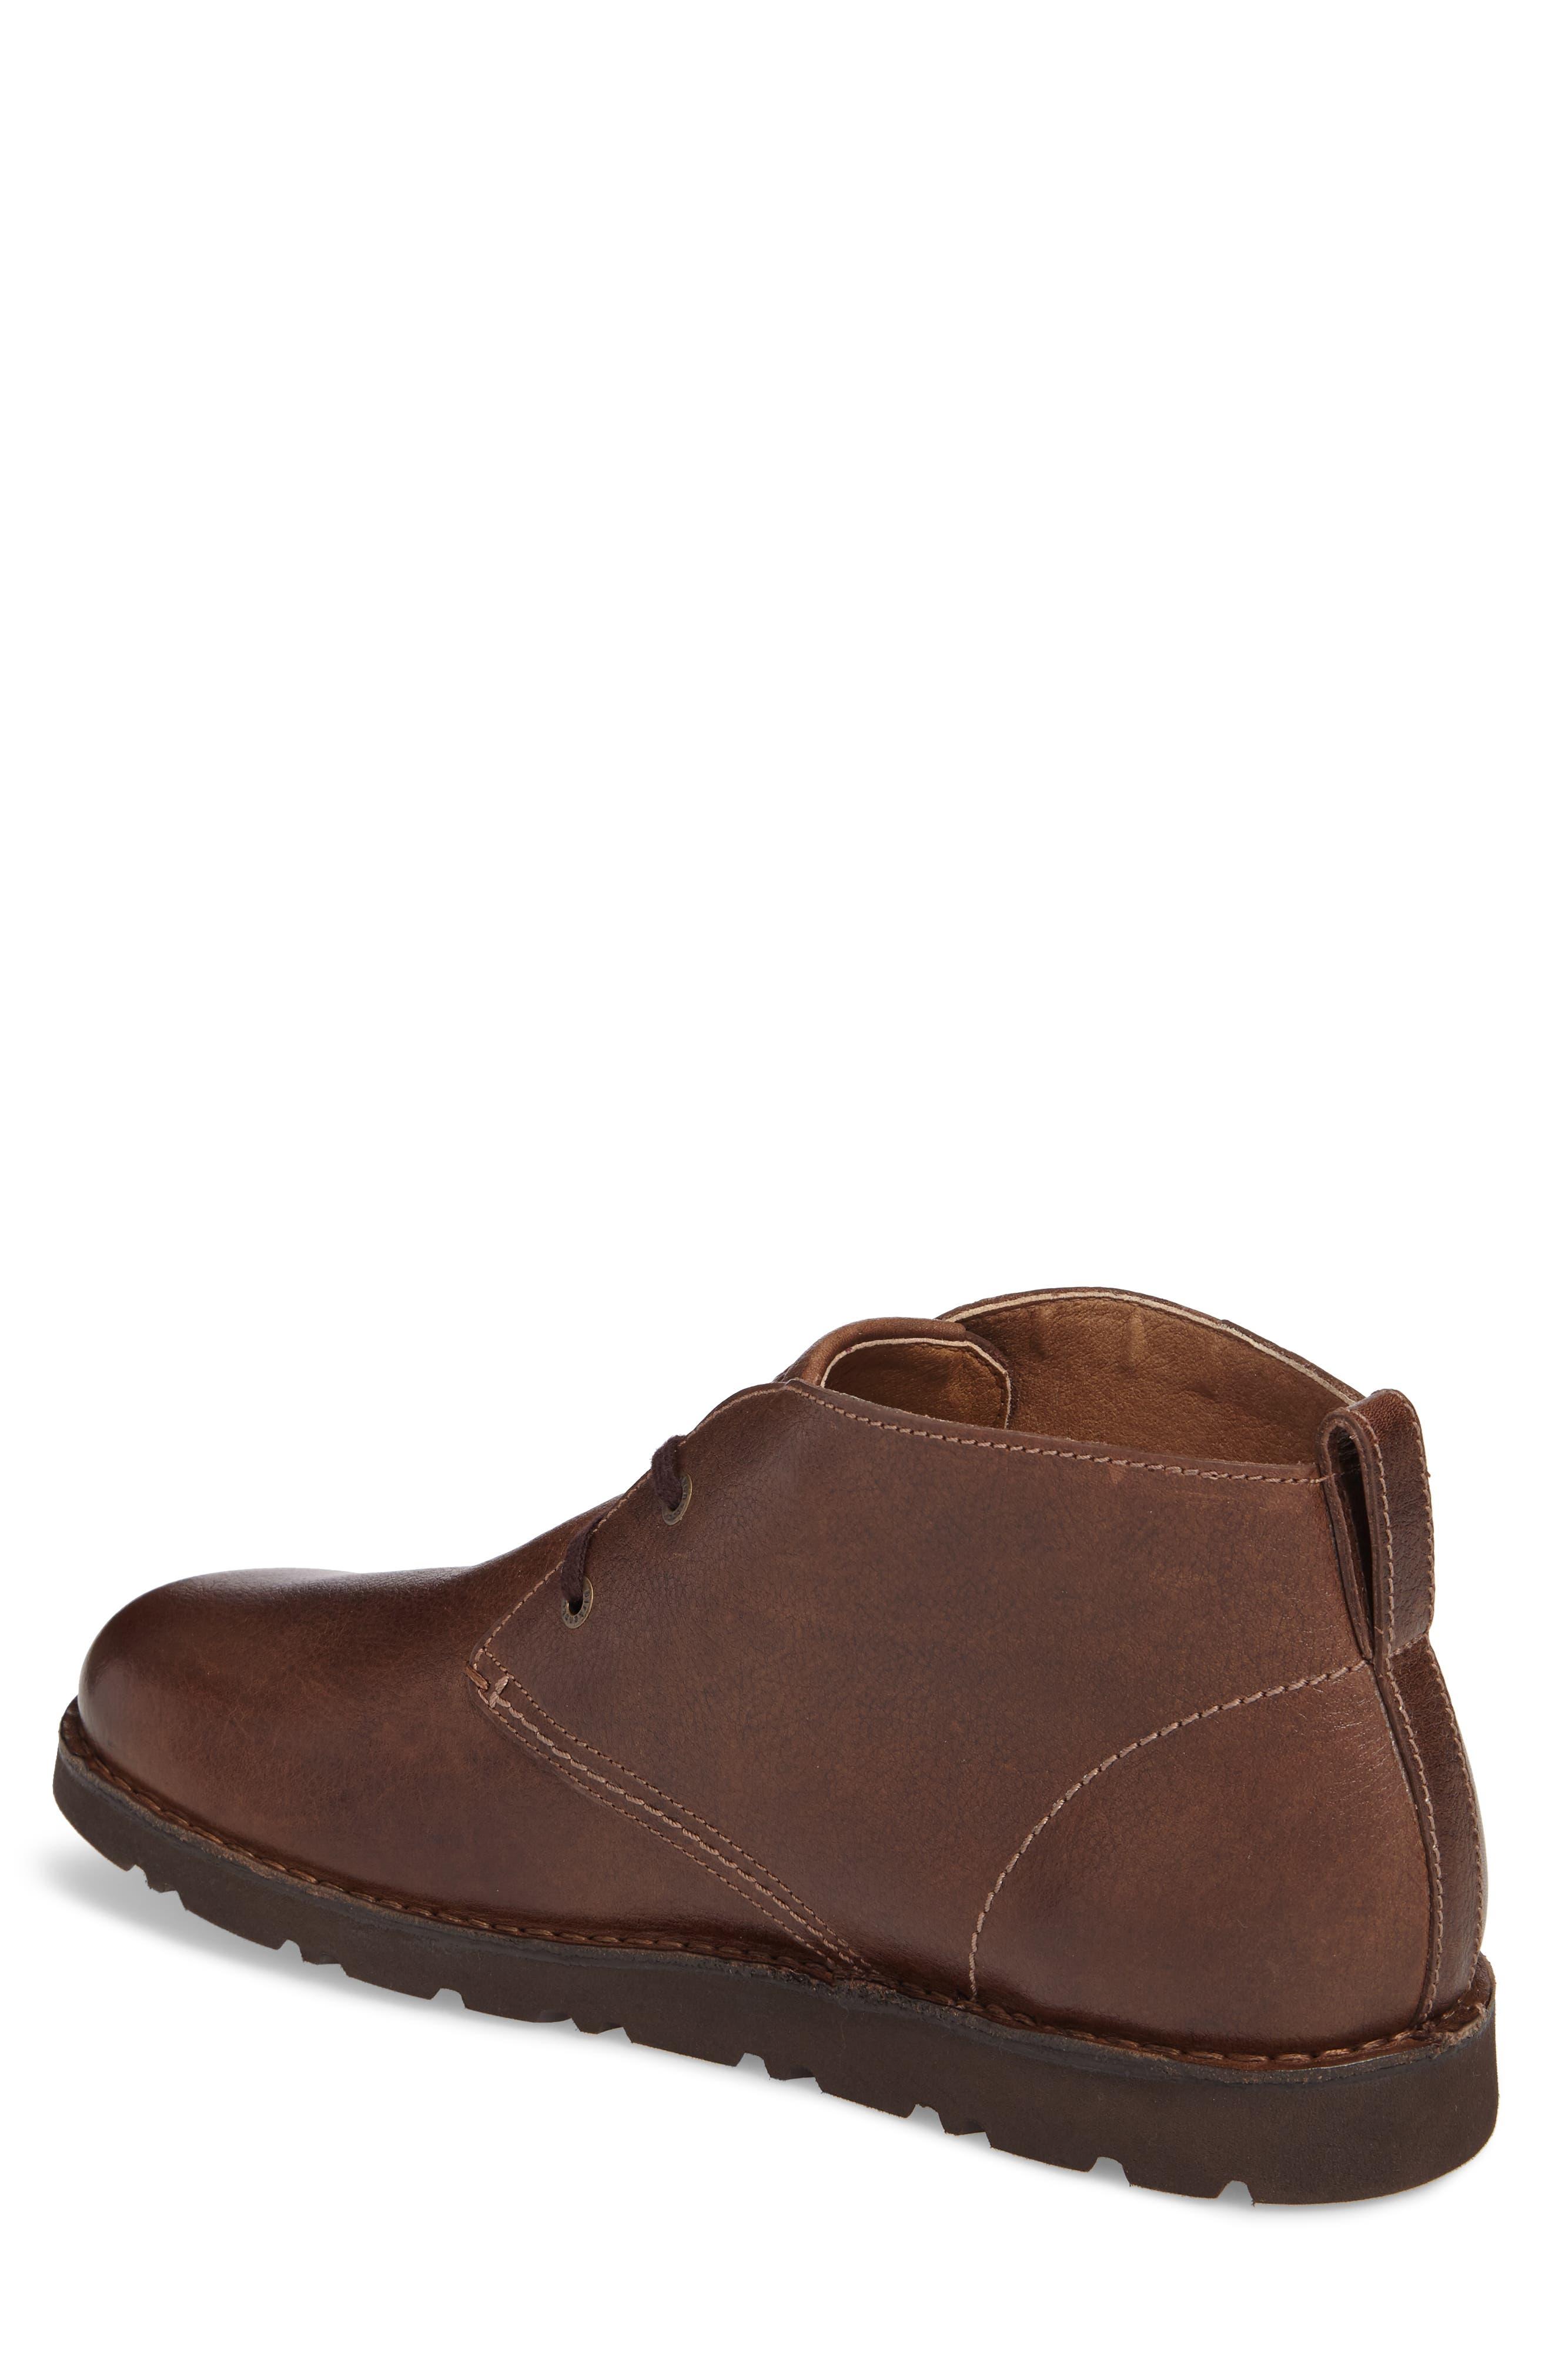 Alternate Image 2  - Birkenstock 'Harris' Chukka Boot (Men)